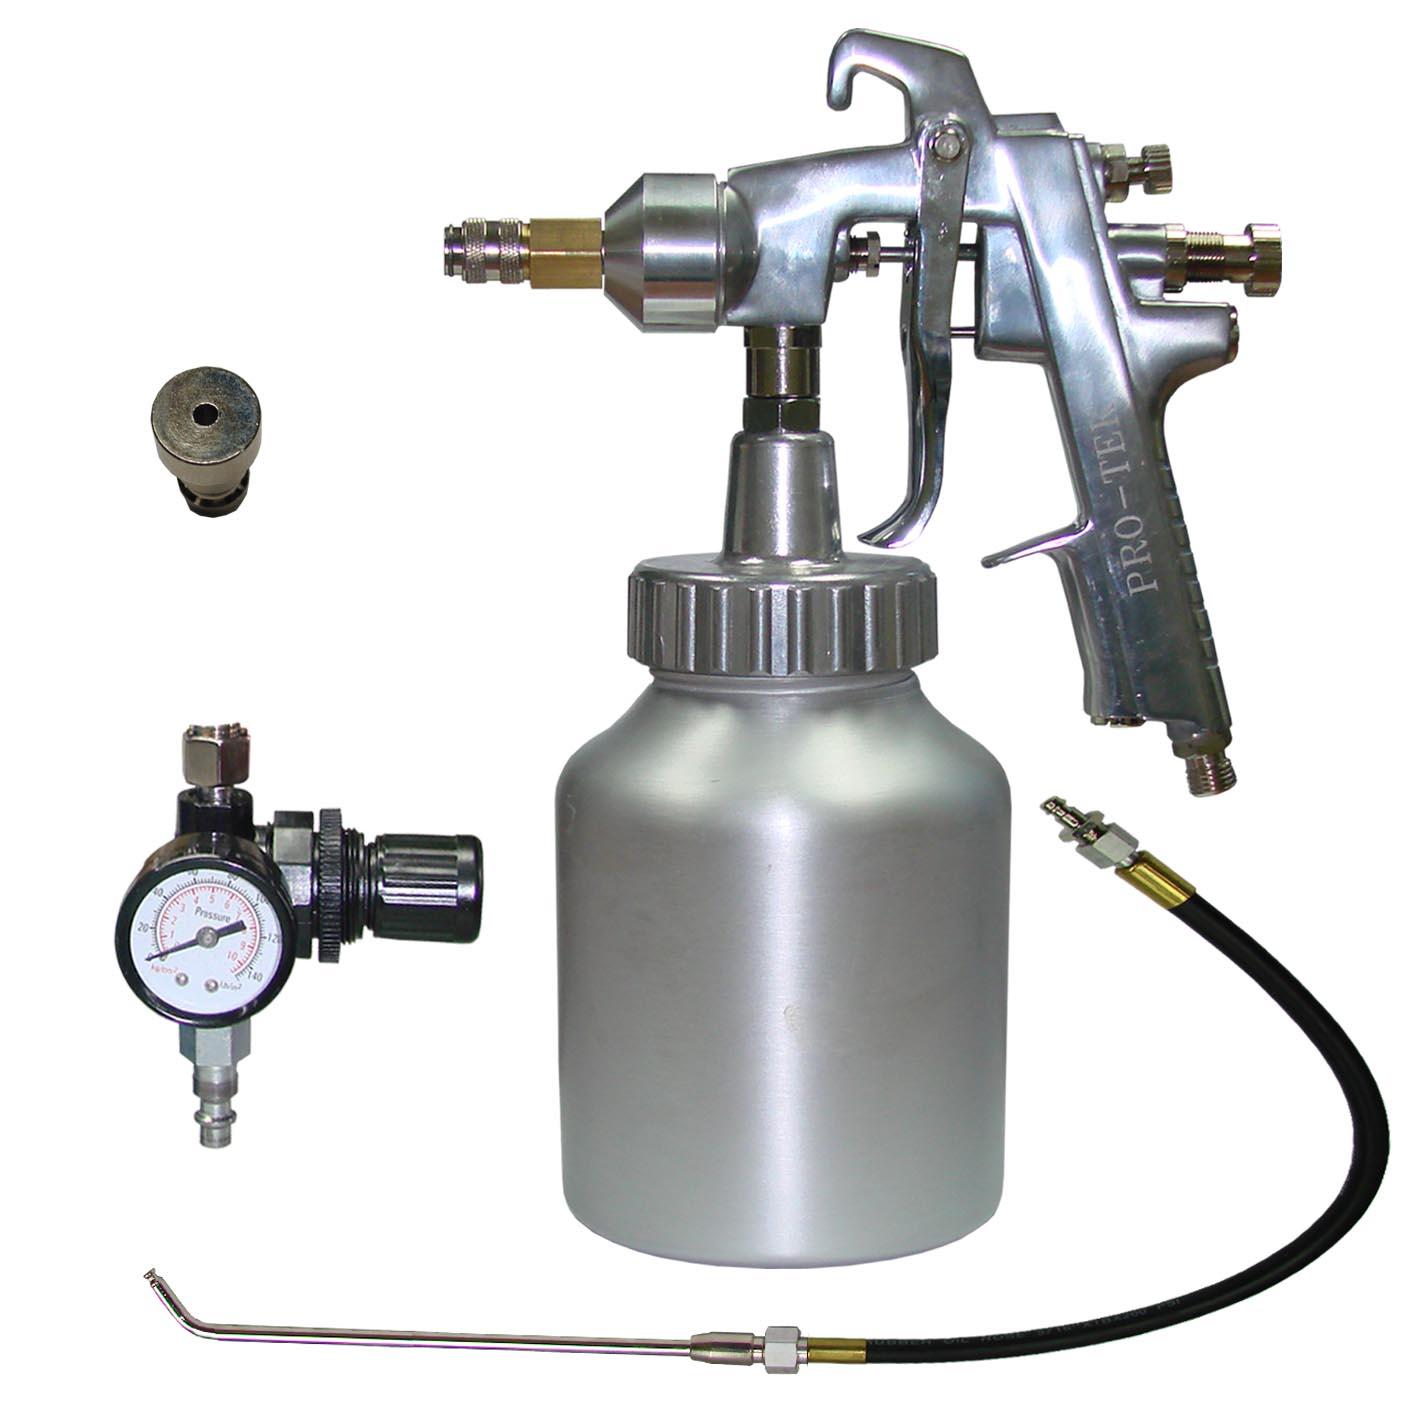 Rust Proofing Gun Pro Teksprayequipment Com